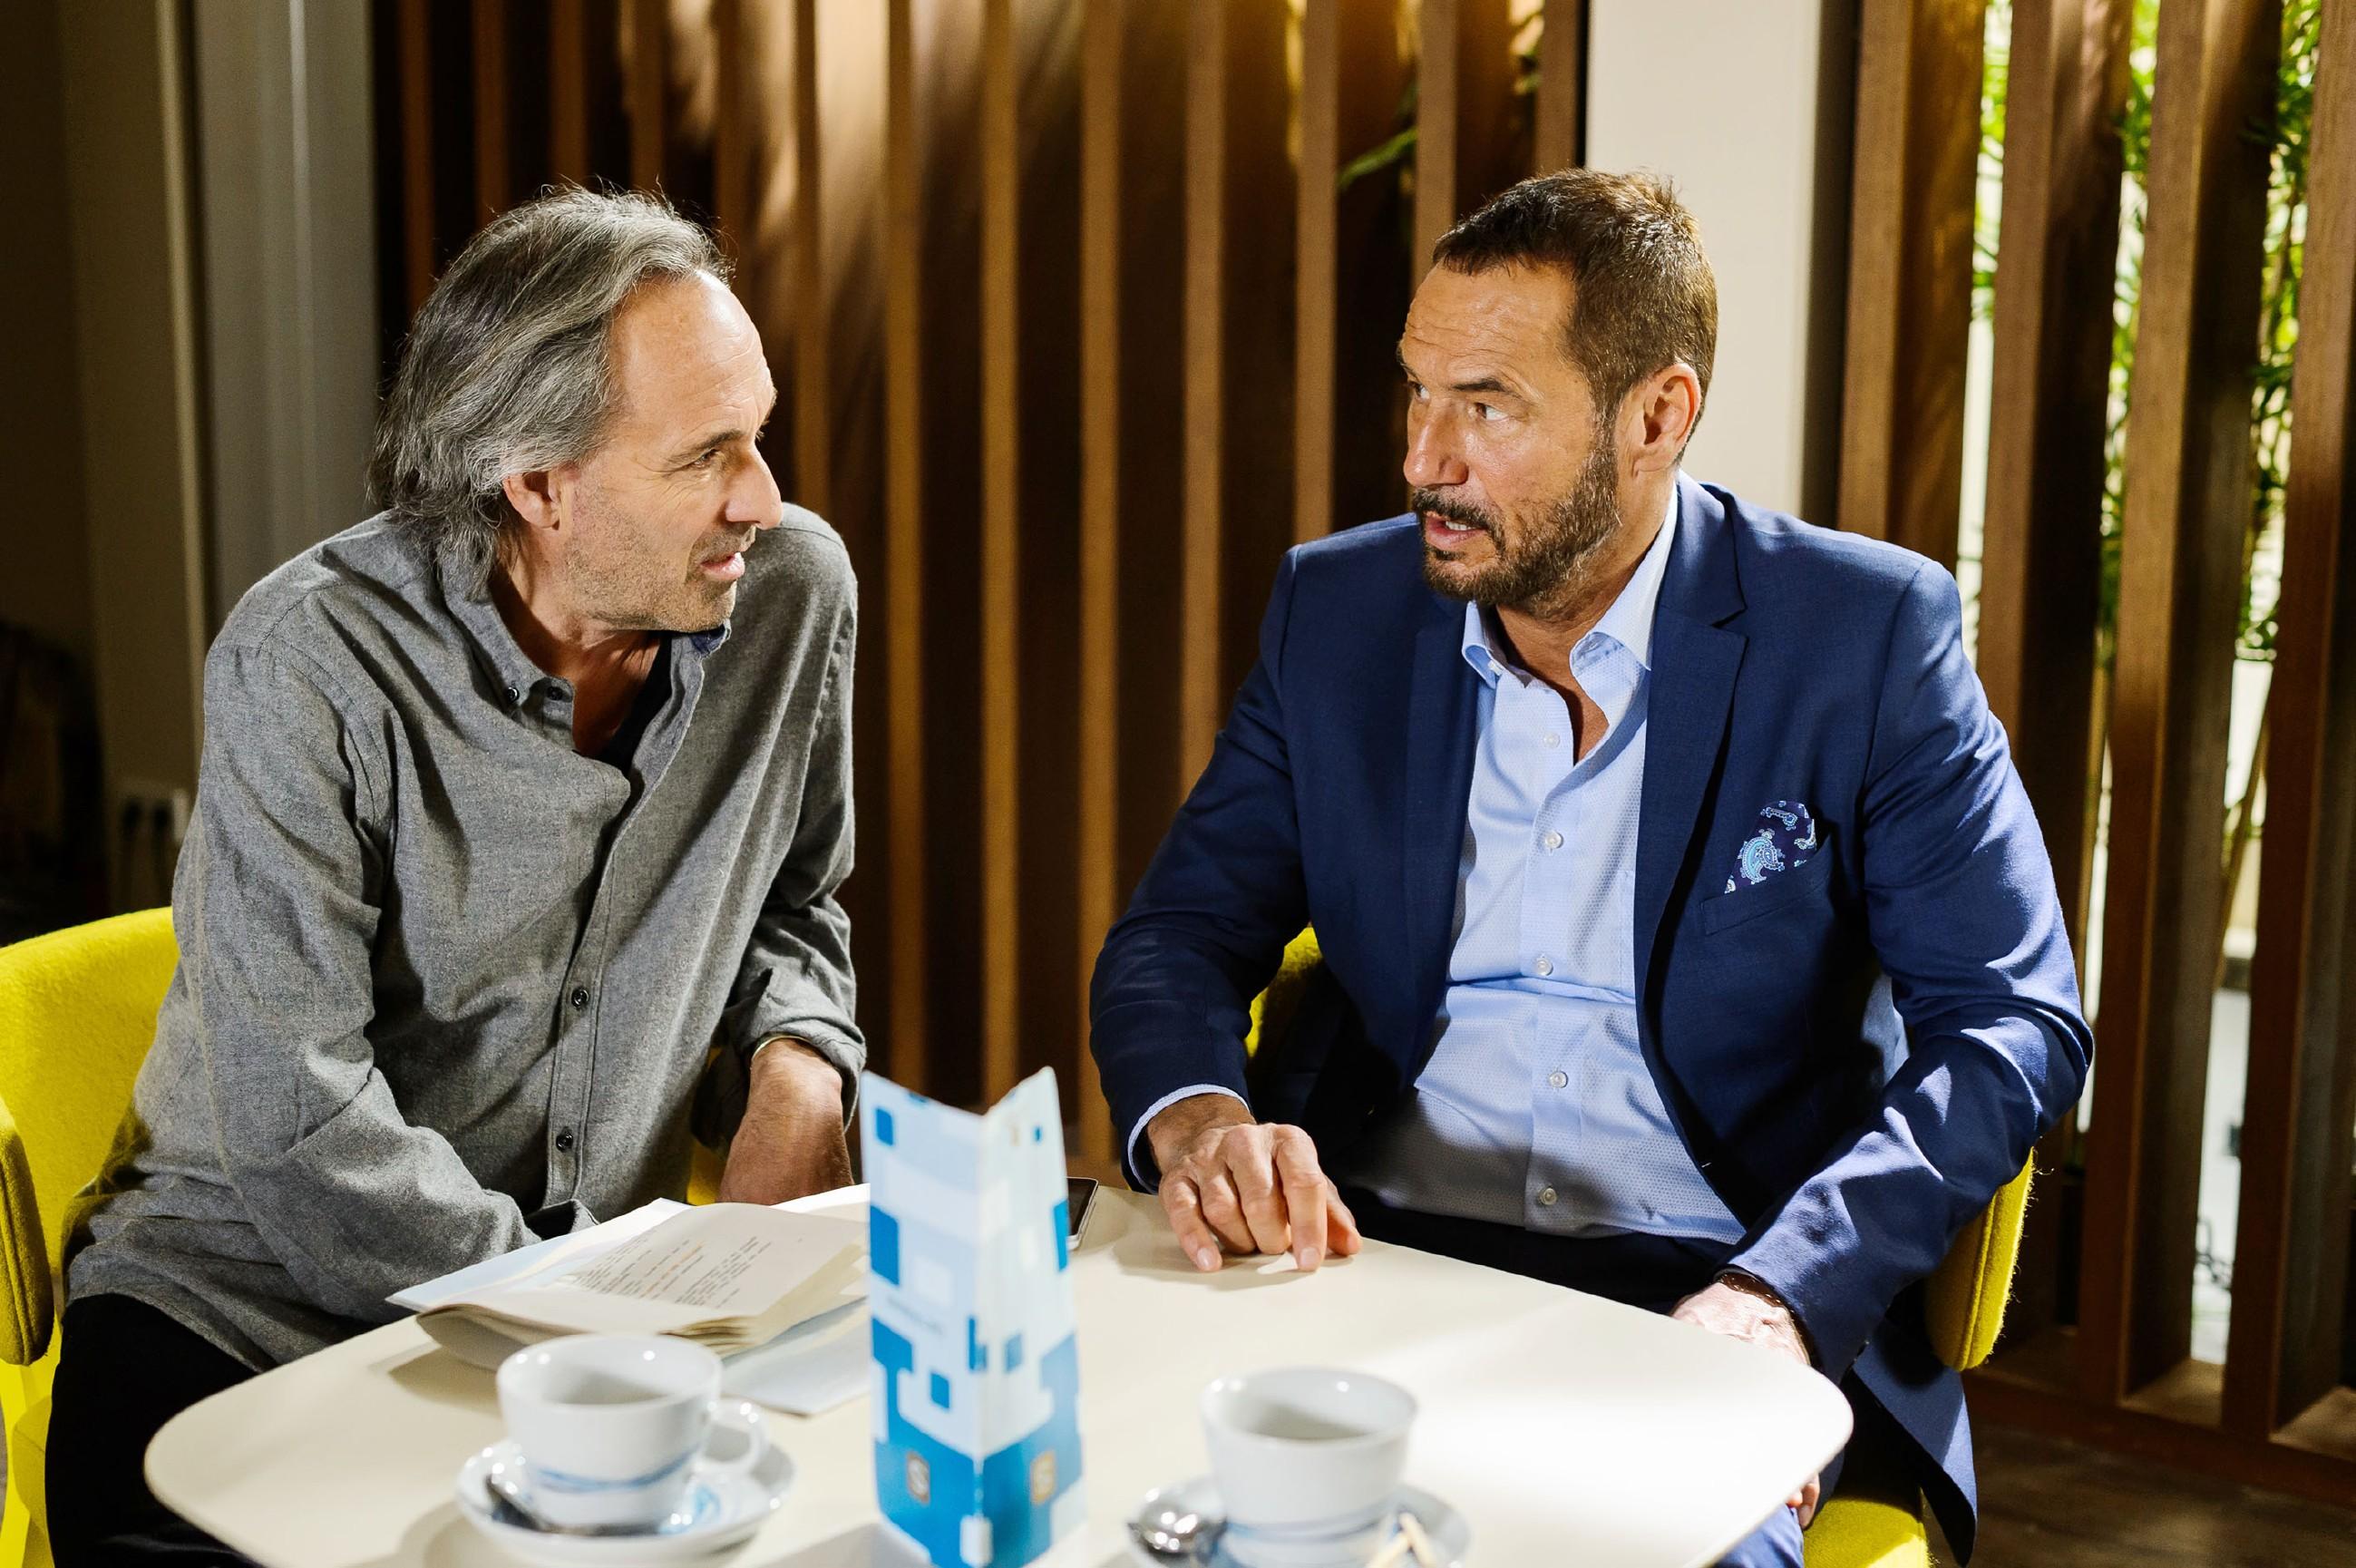 Richard (Silvan-Pierre Leirich, r.) versucht, bei Johann Pachlhuber (Holger Christian Gotha) Punkte zu sammeln. (Quelle: RTL / Willi Weber)